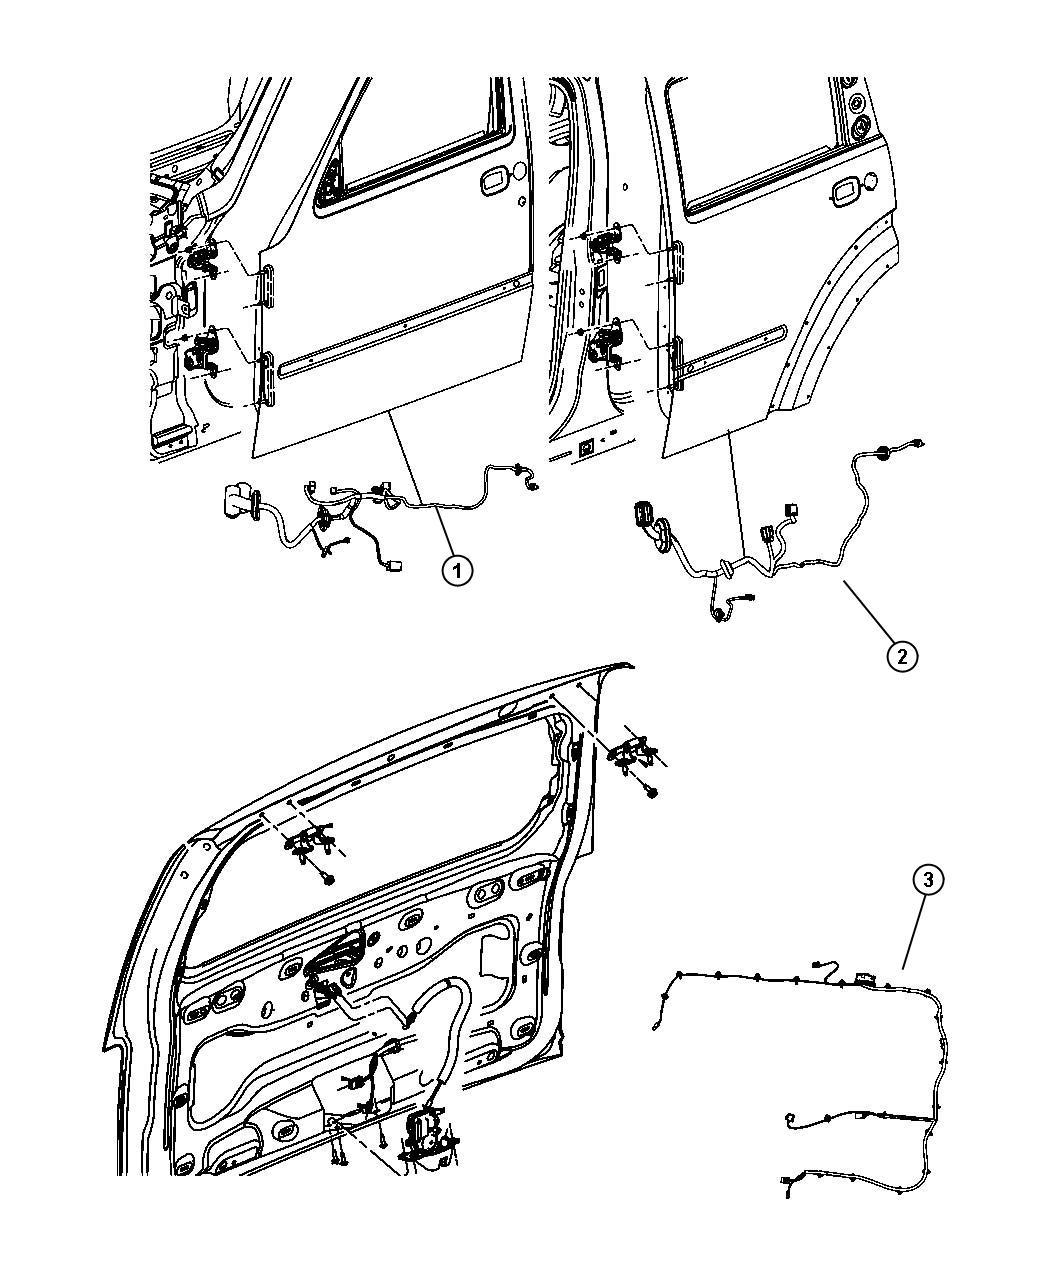 Dodge Nitro Wiring. Rear door. Right or left. [8 amplified